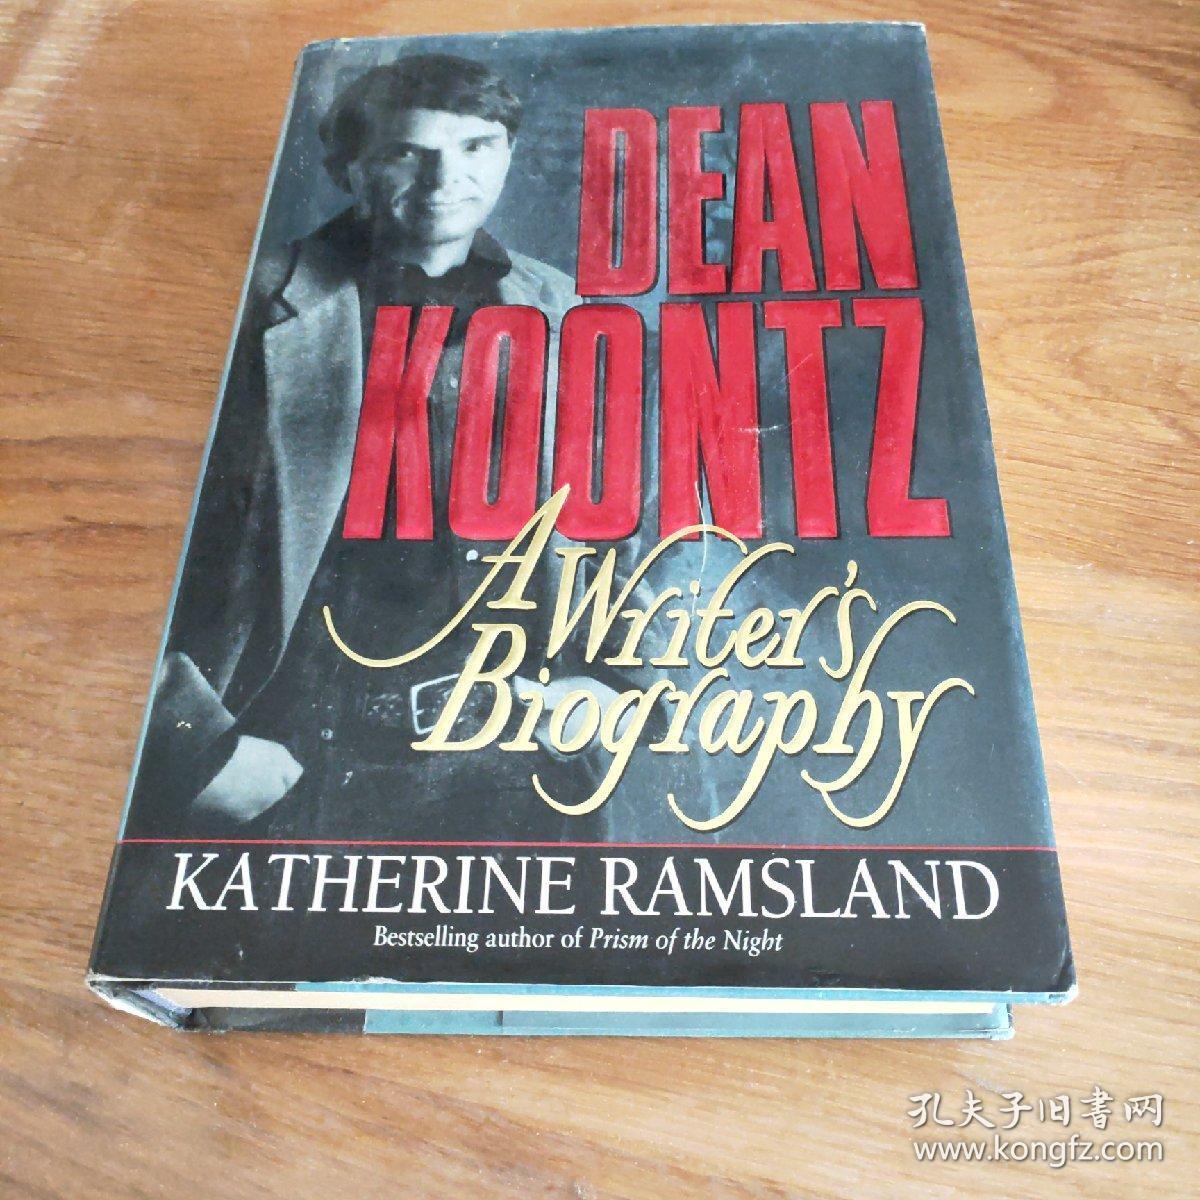 dean koontz:a writer's biography  by katherine ramsland 【英文版,书名见图】